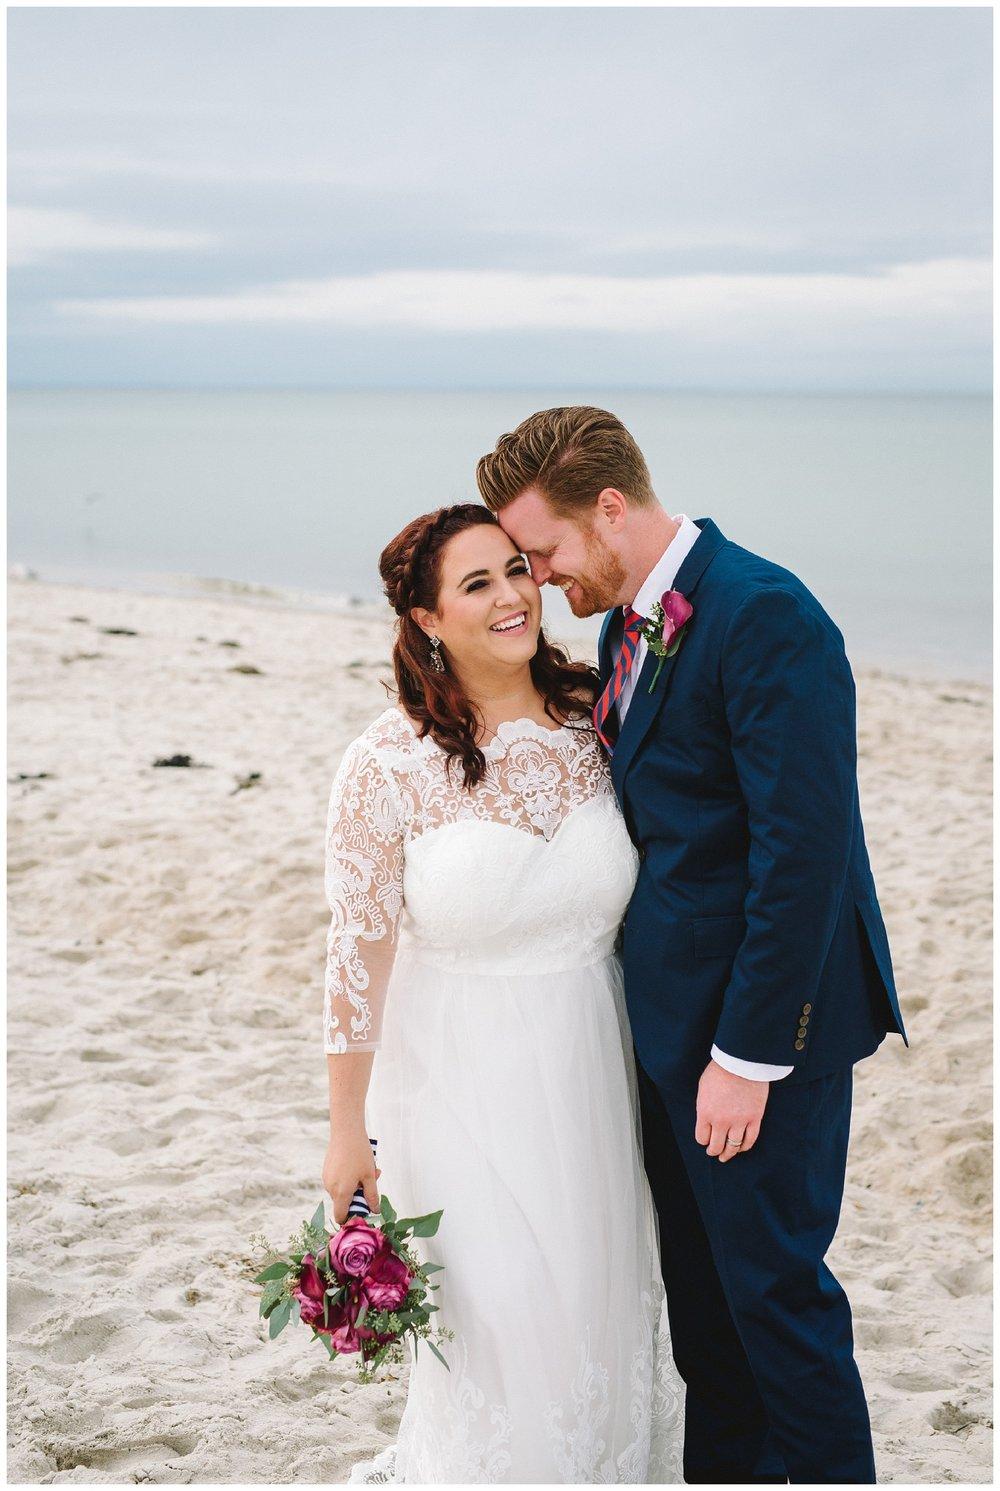 Intimate Beach Wedding Cape Cod Wedding Photographer Yarmouth MA-99.jpg